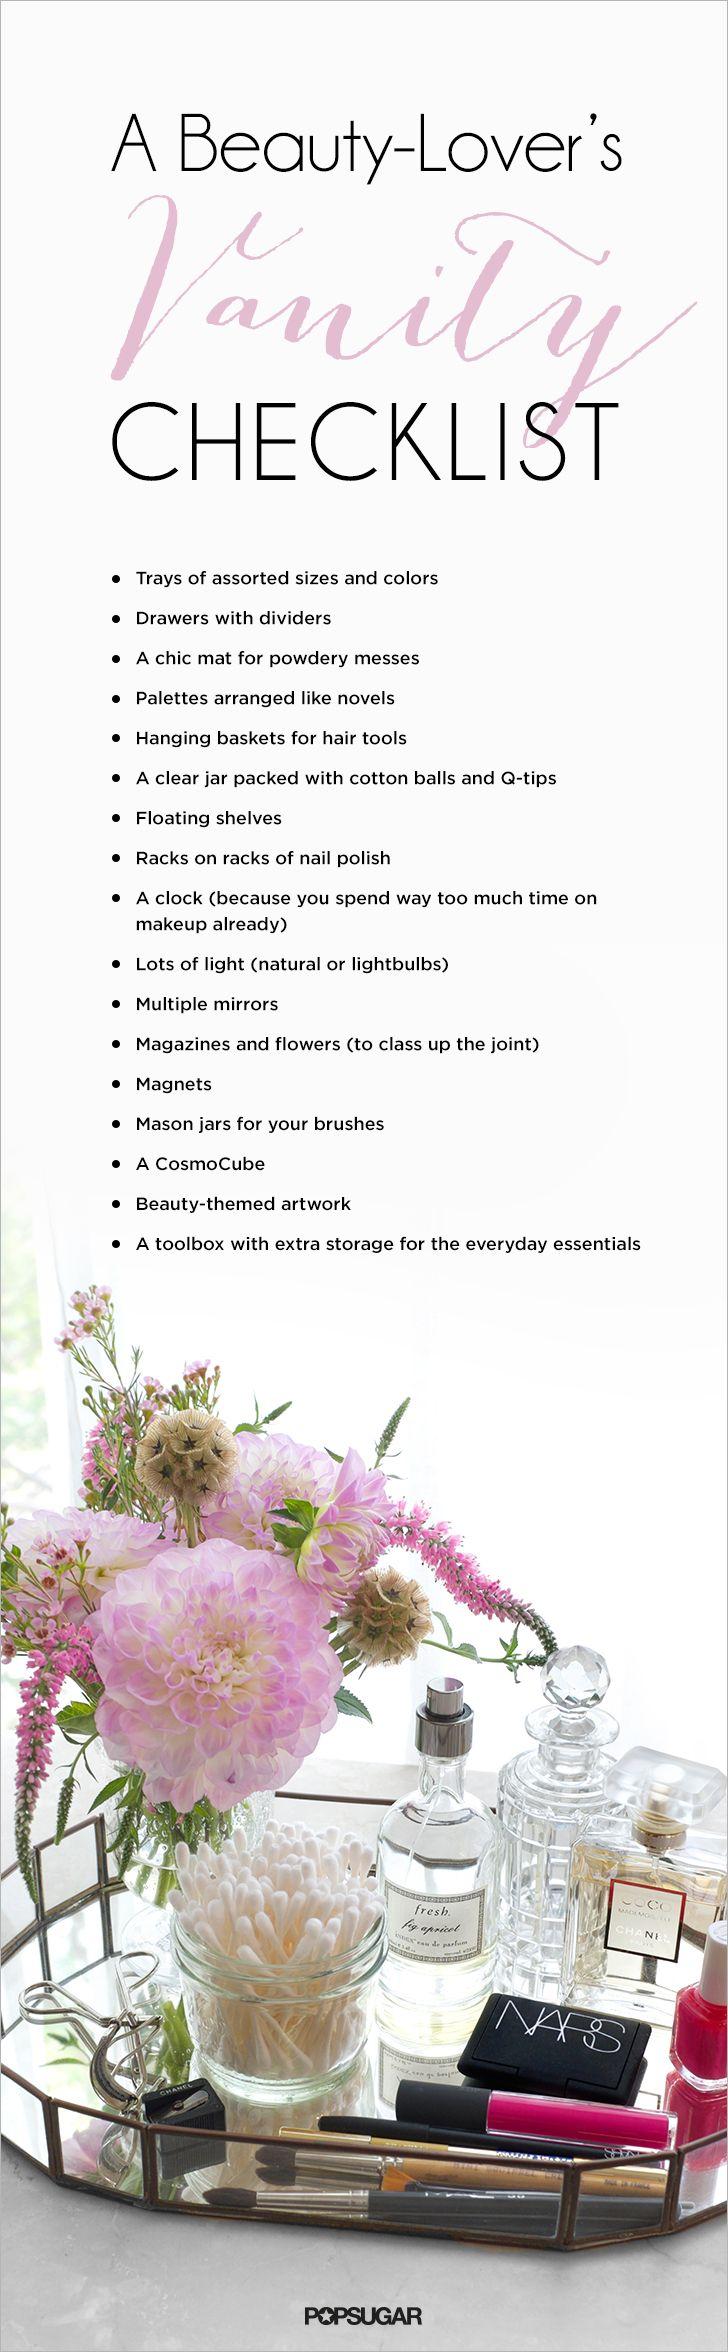 vanity checklist